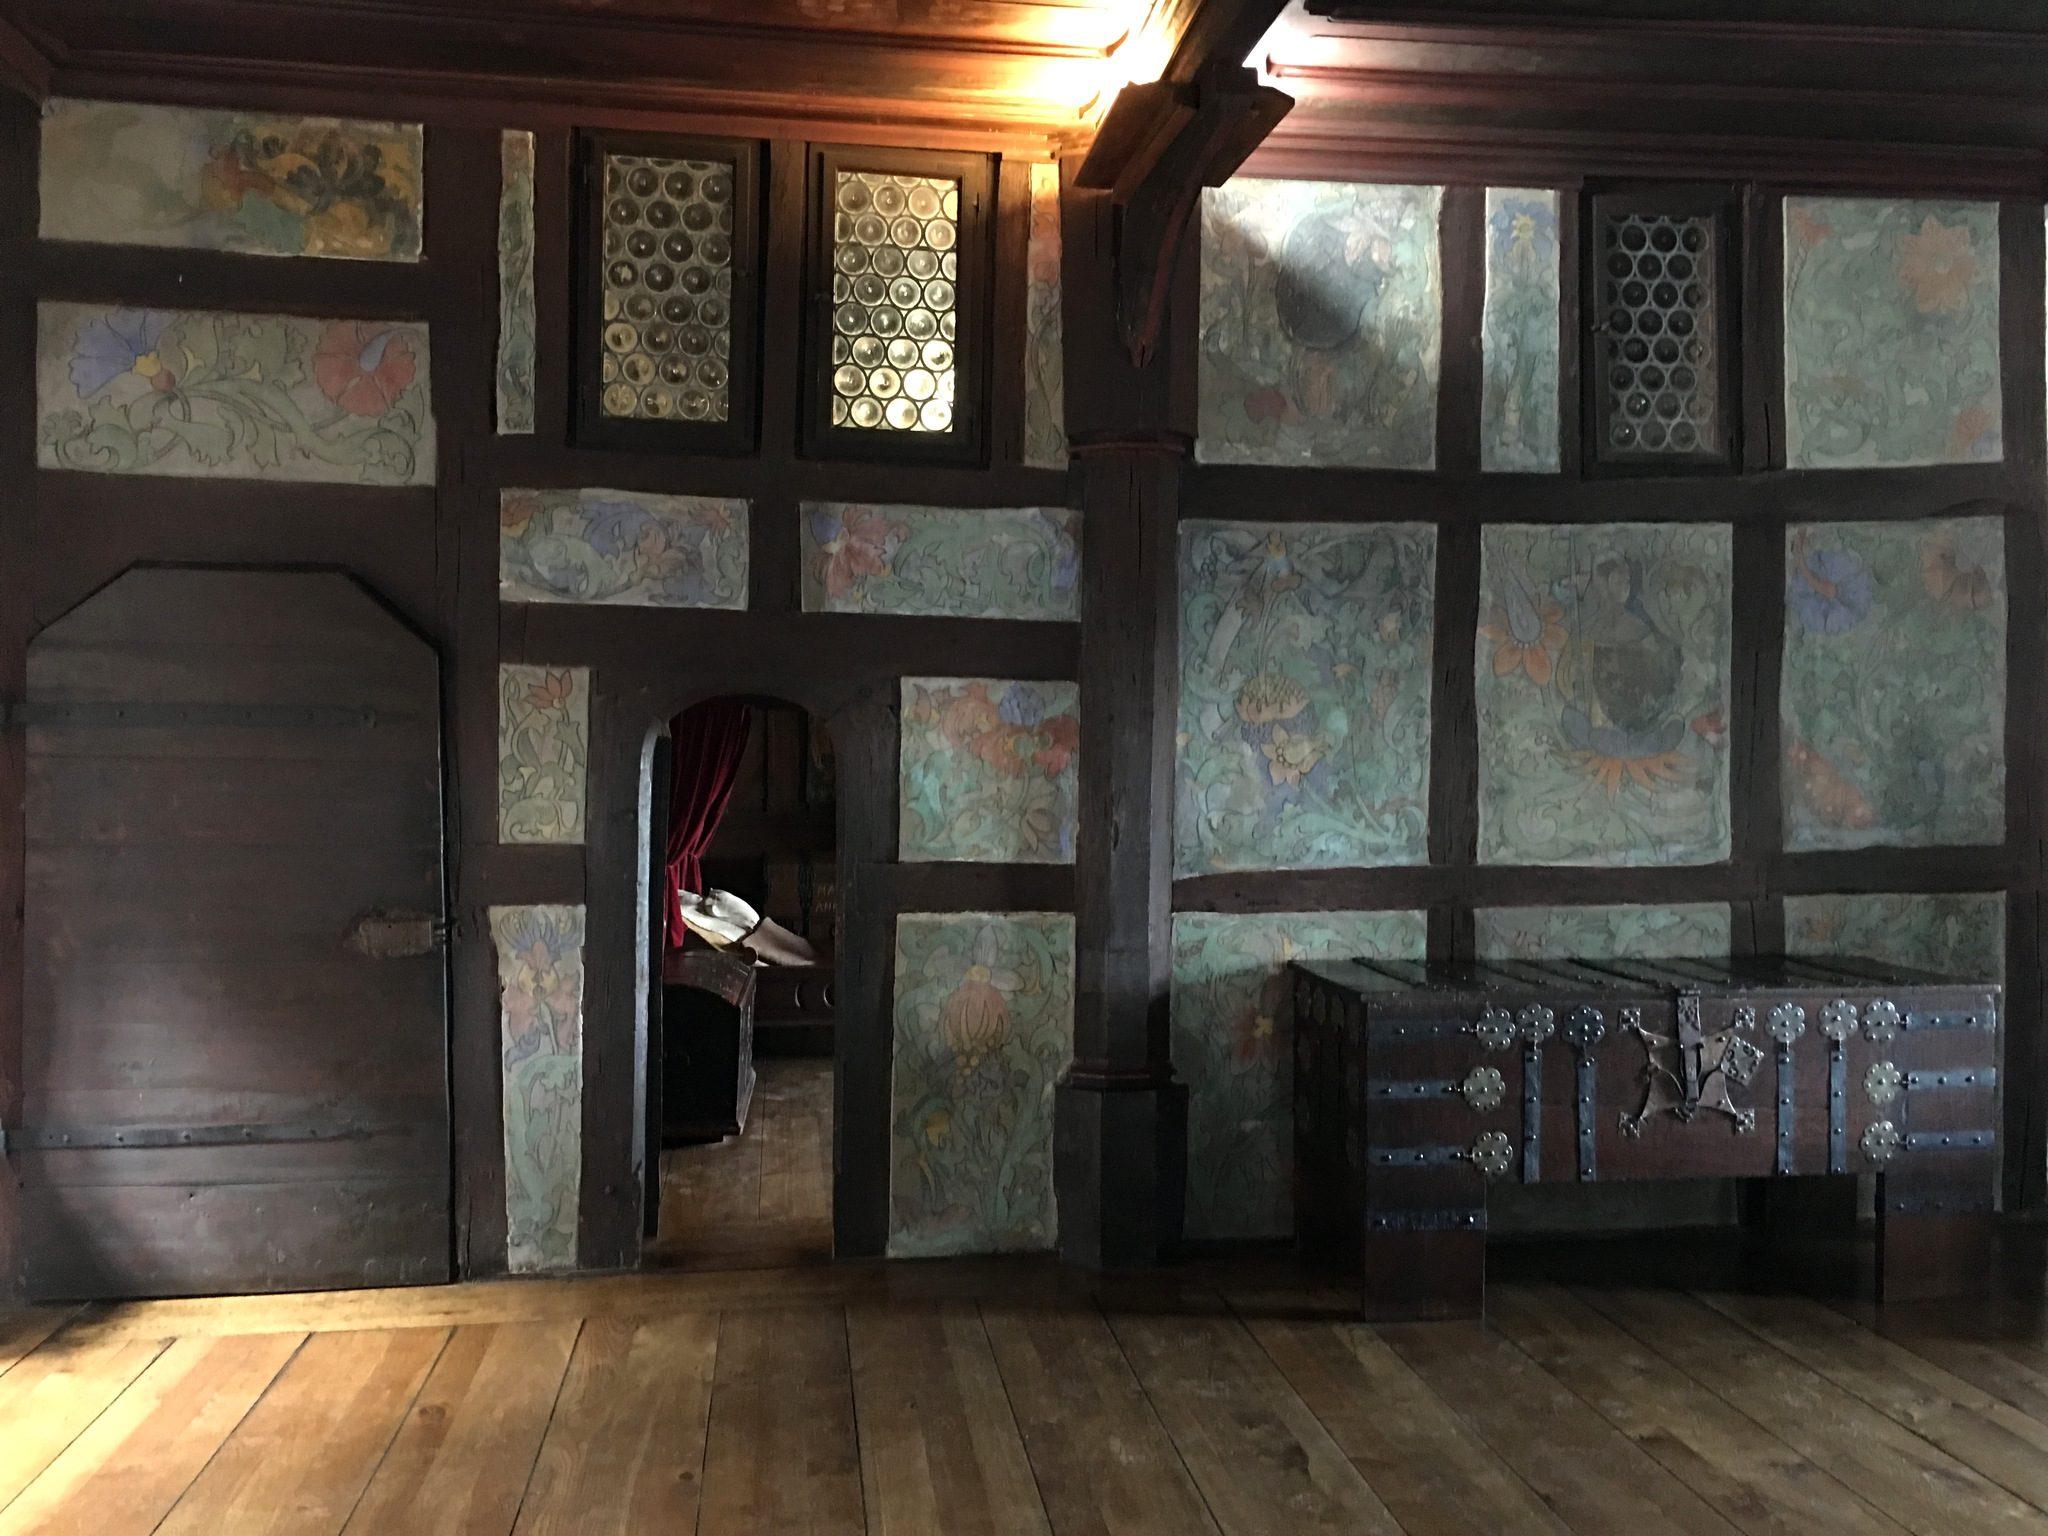 Blick aus dem Rittersaal zur Kemenate.